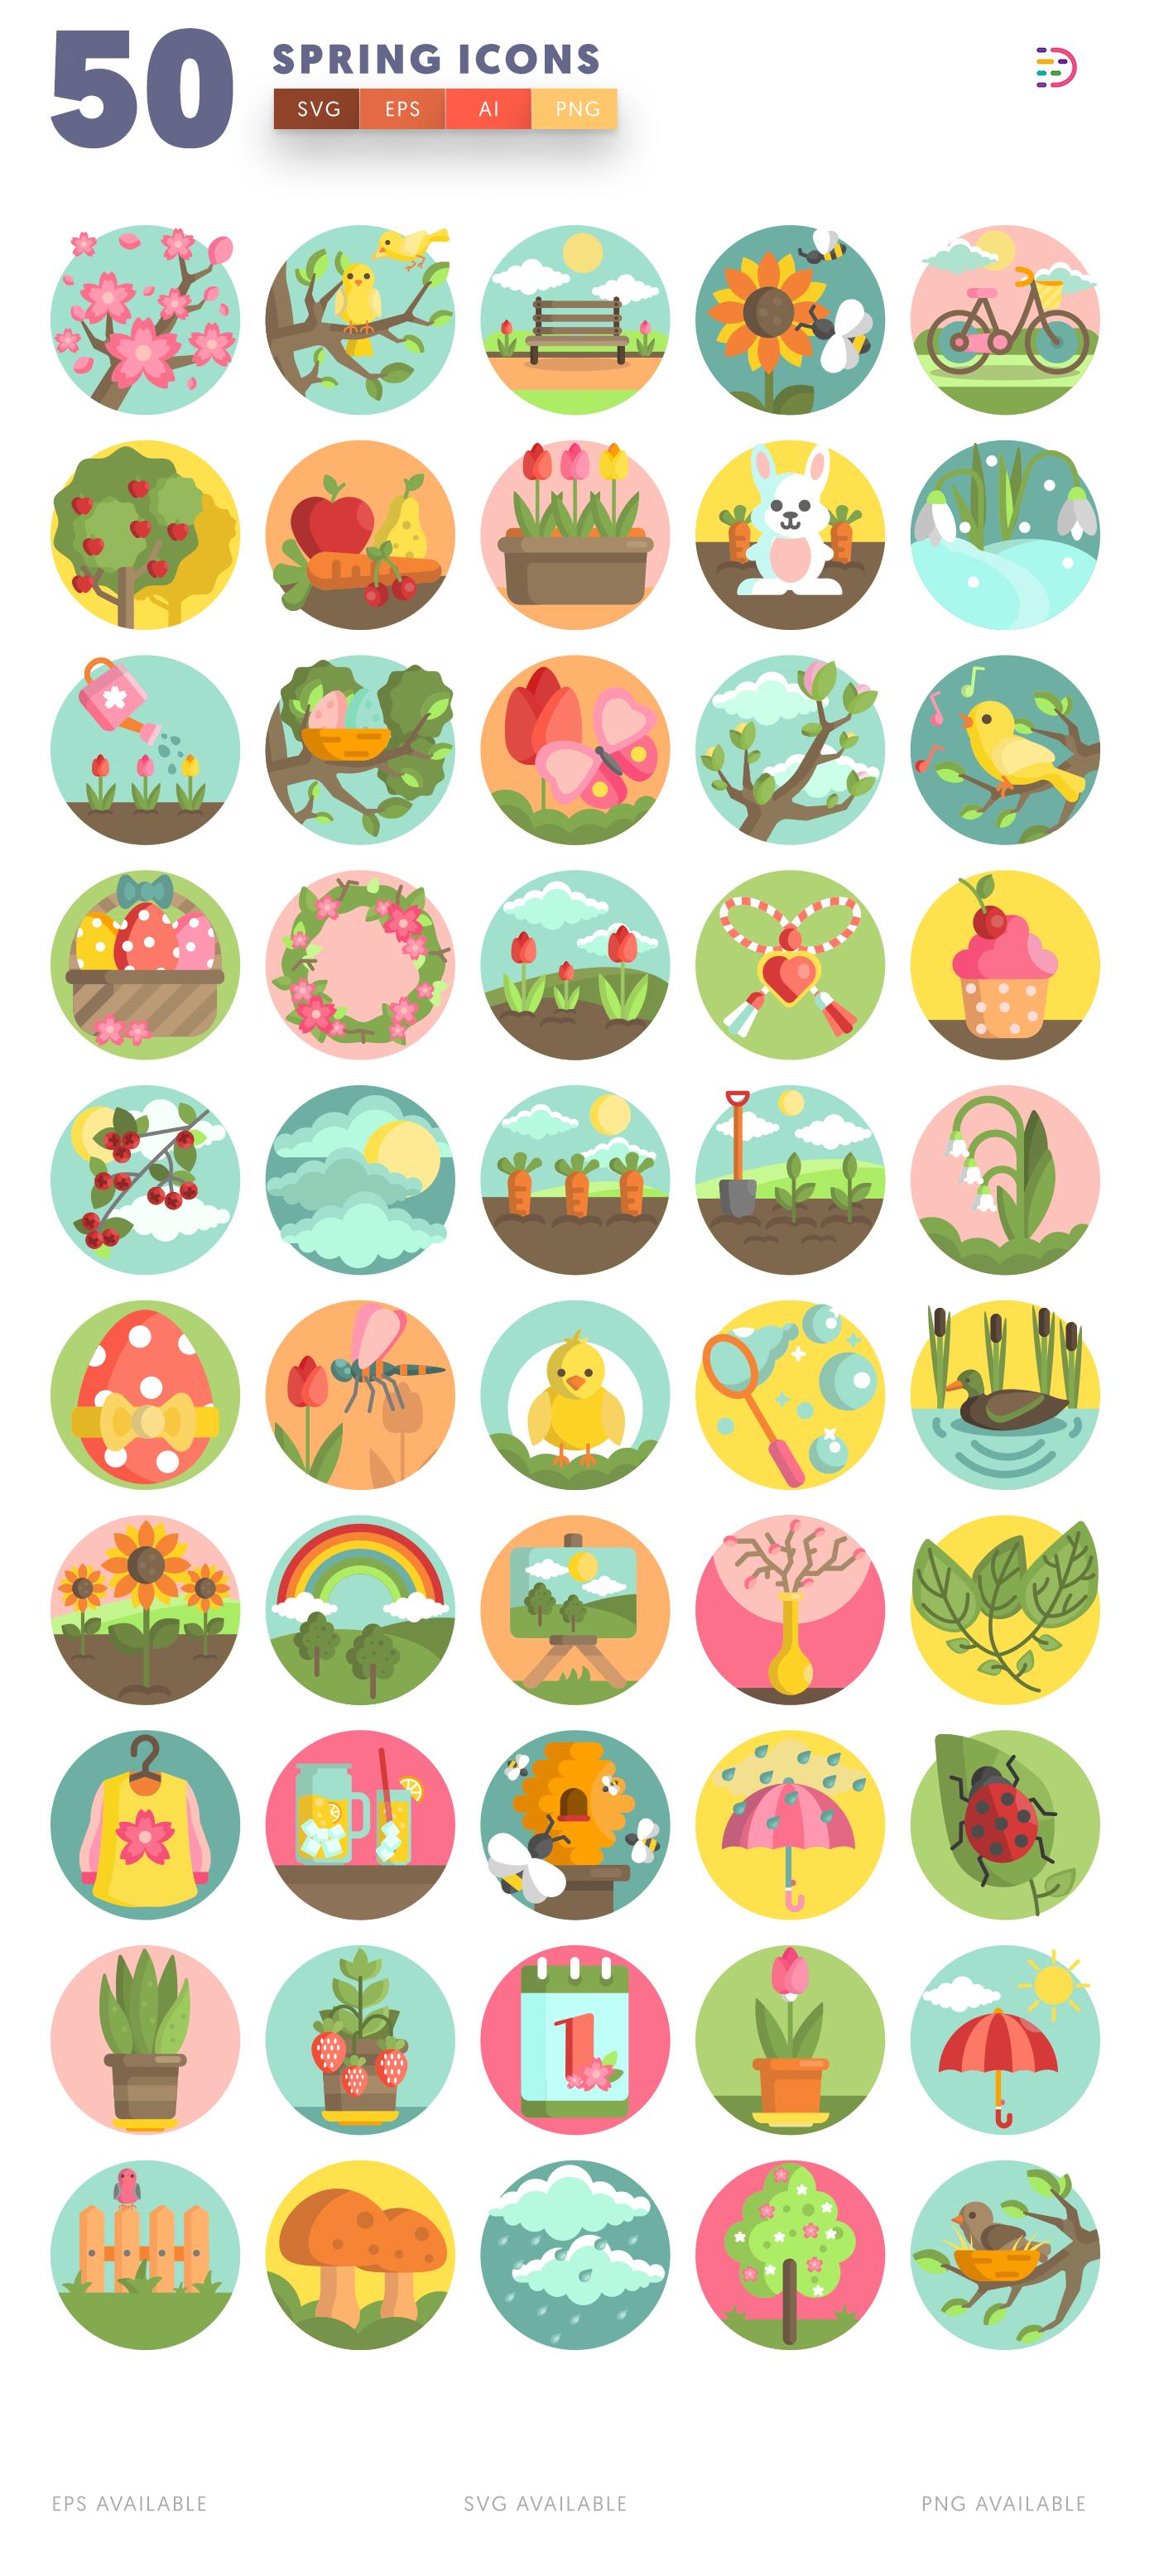 Design ready 50 Spring Icons